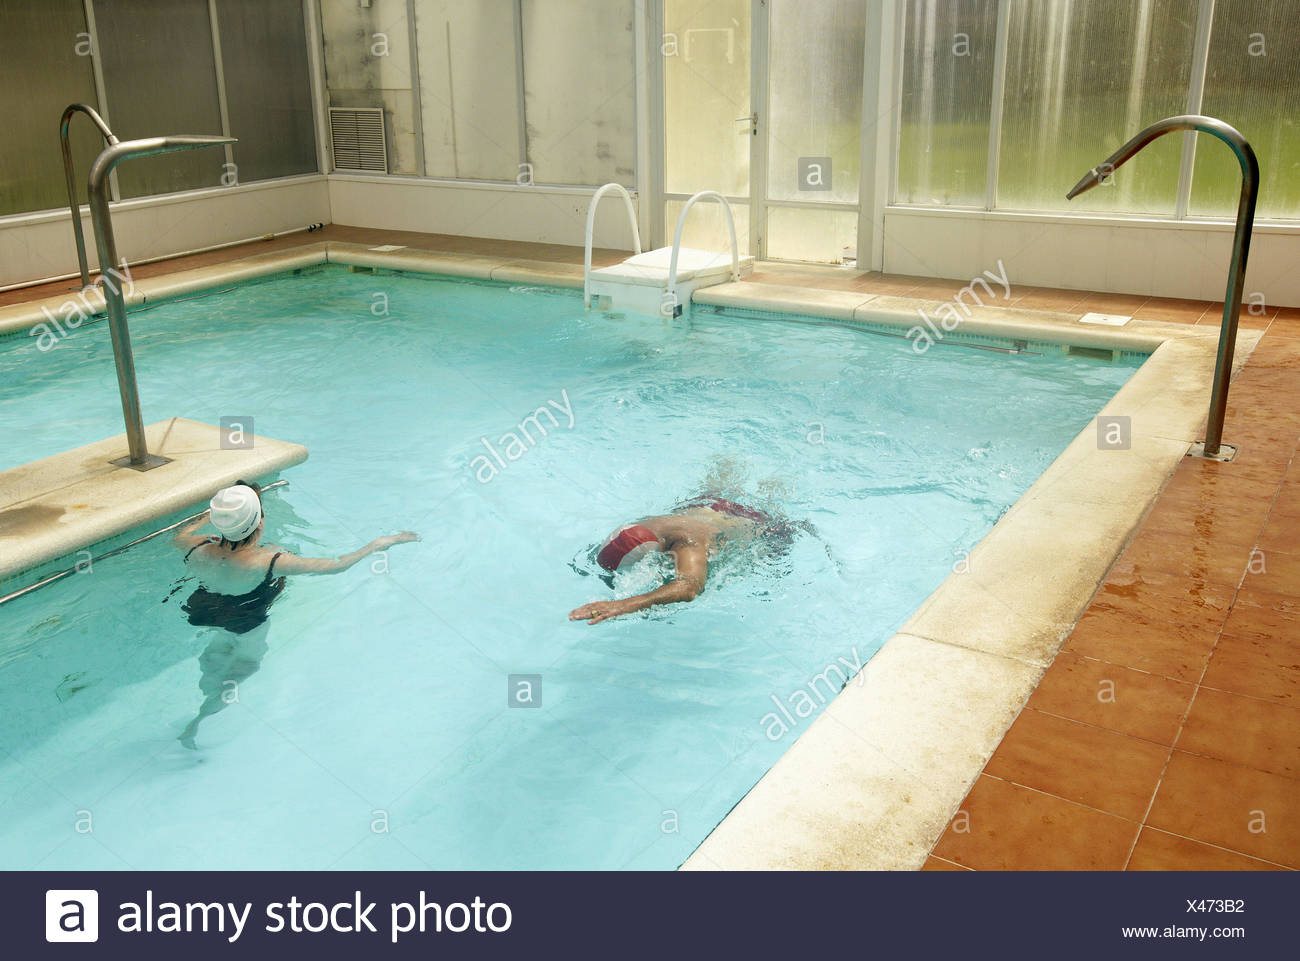 Thermal baths, spa, Lierganes, Cantabria, Spain Stock Photo ...